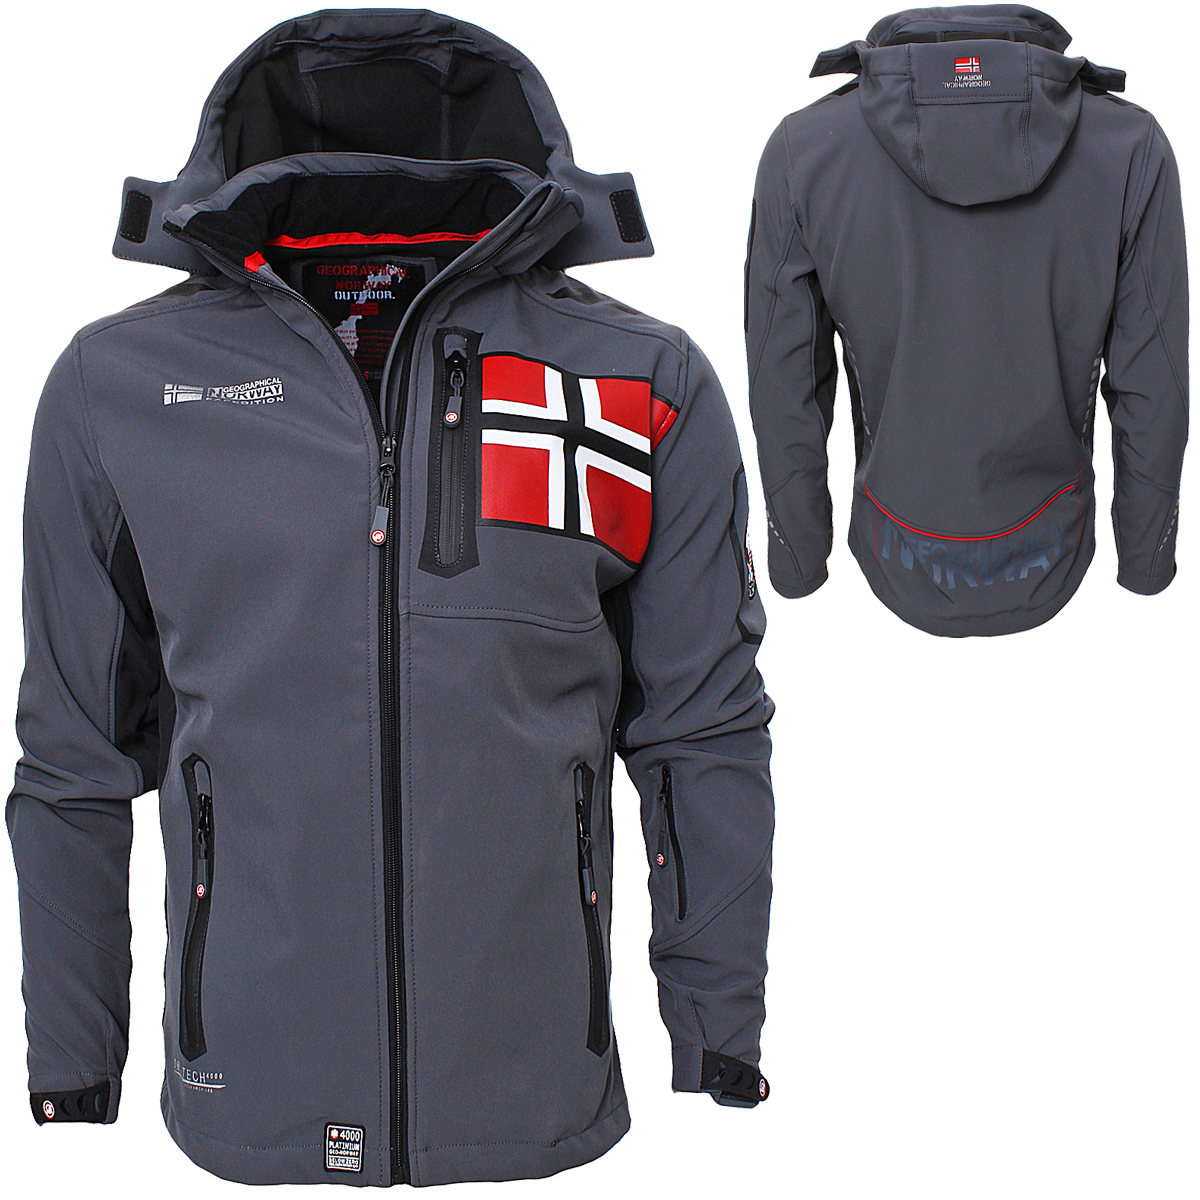 Geographical Norway Rova Uomo Giacca Softshell Uomo Giacca Invernale S-XXL